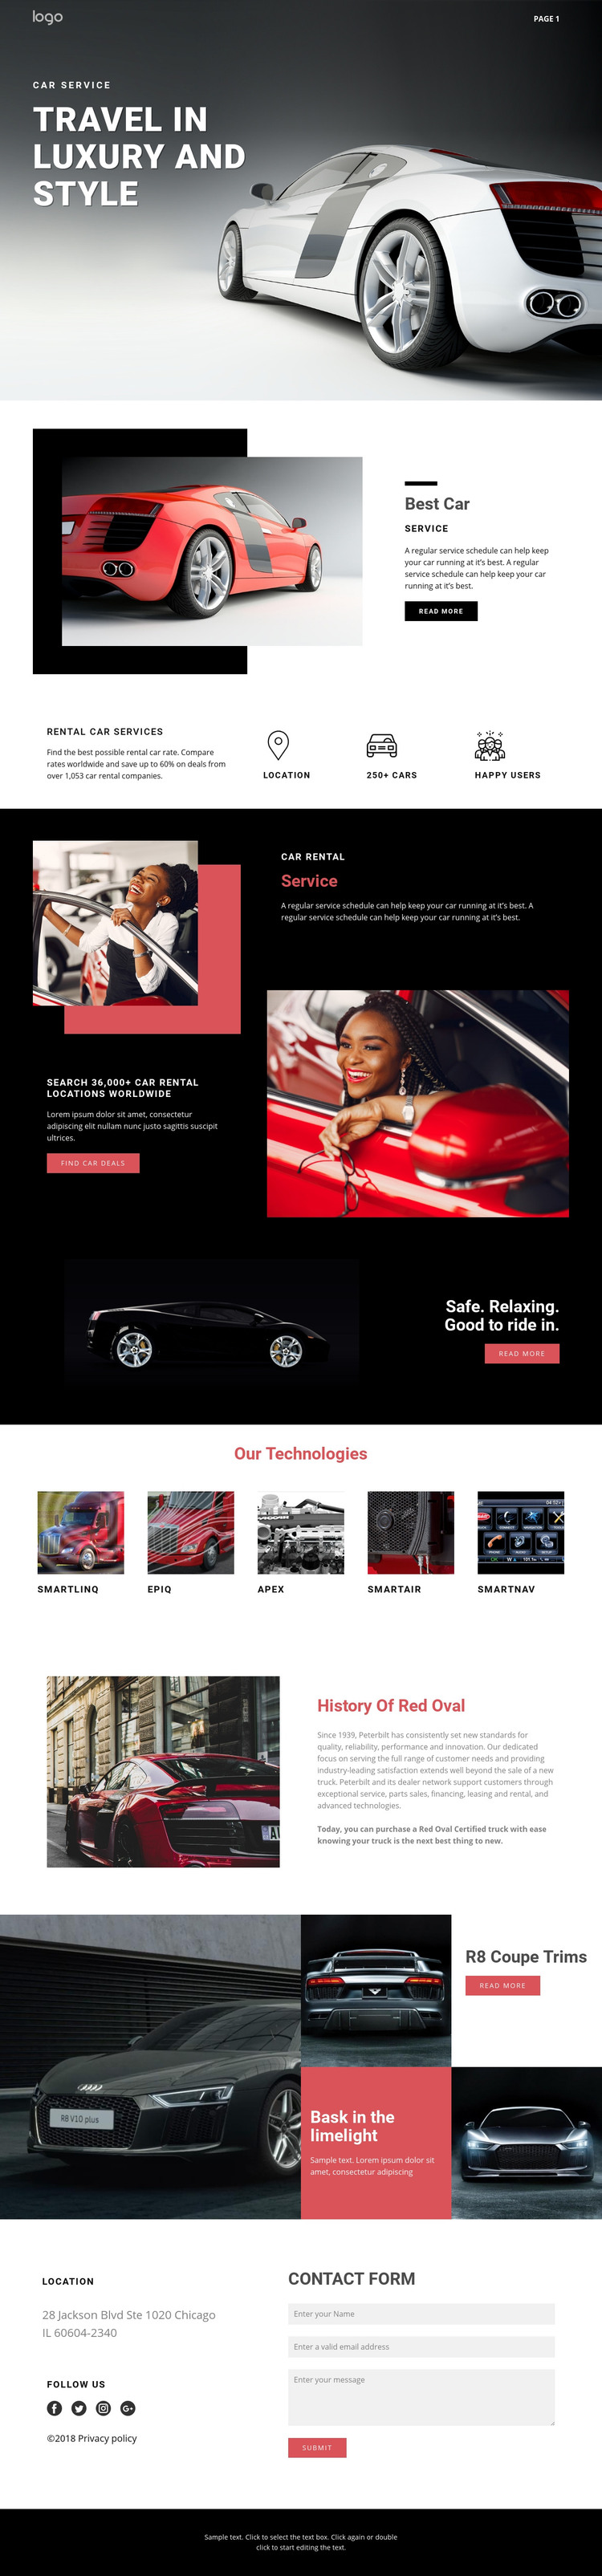 Traveling in luxury cars Homepage Design